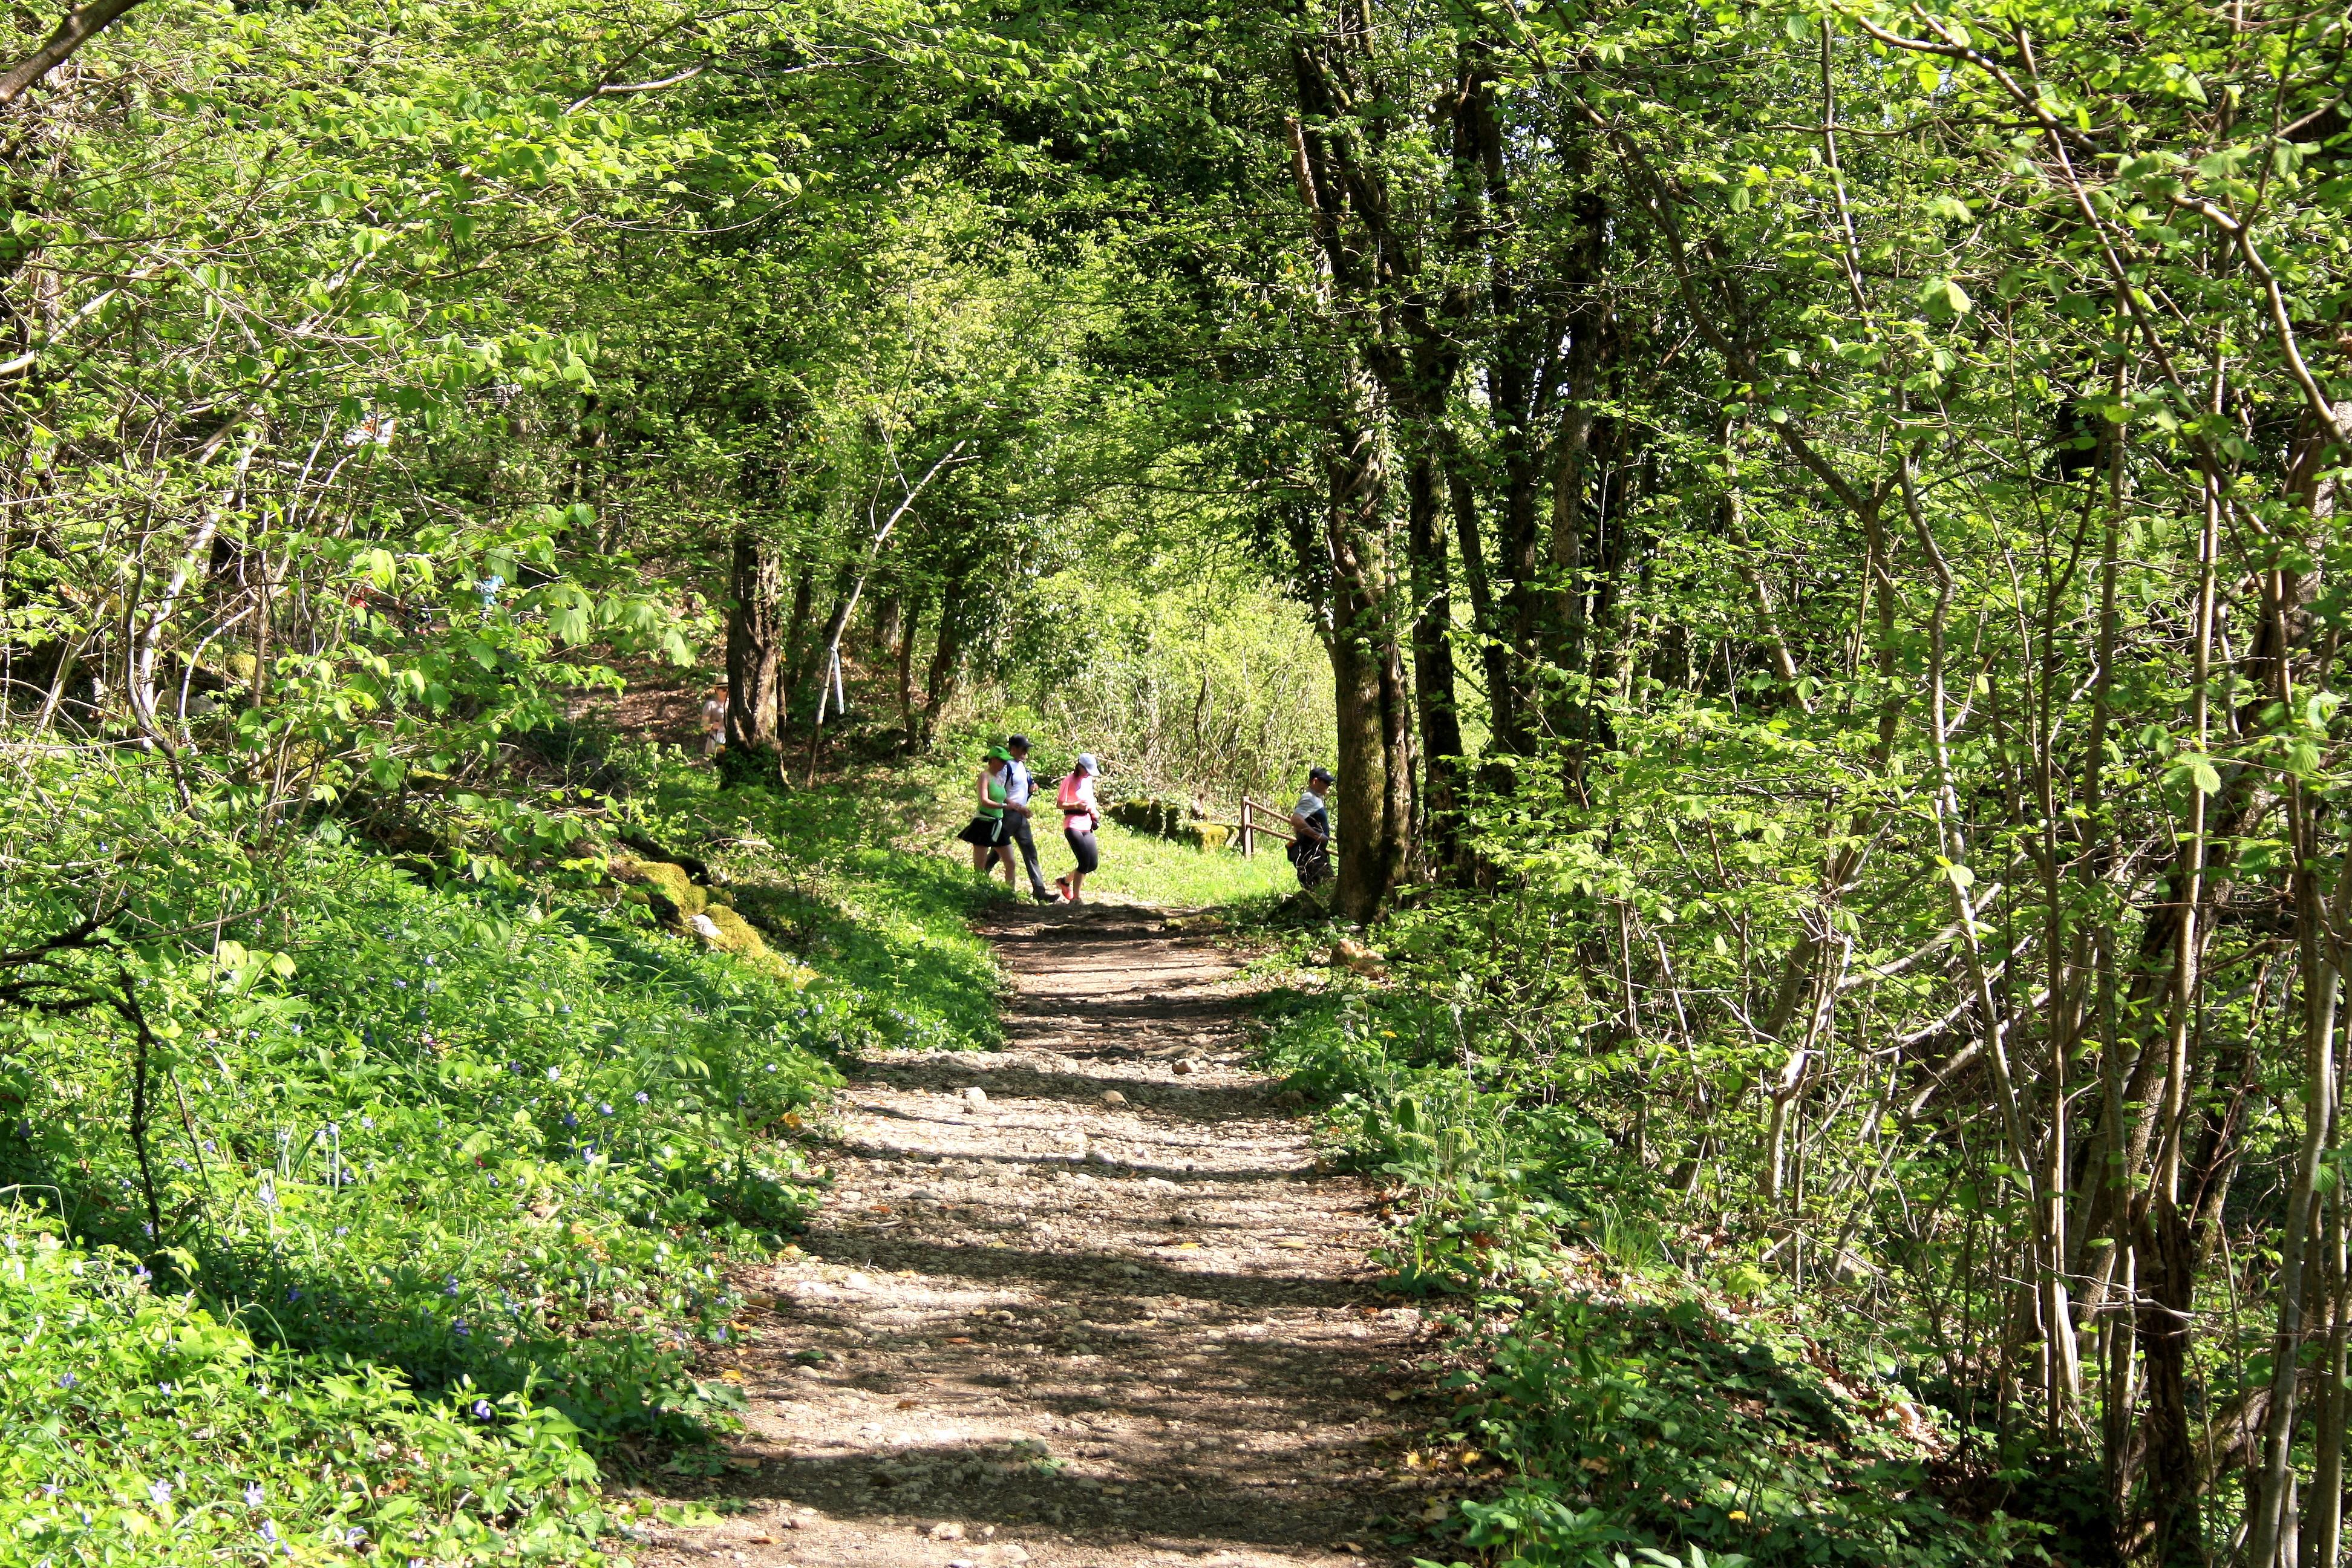 2017-04-09 - Trail-Montfaucon (244) - Copie